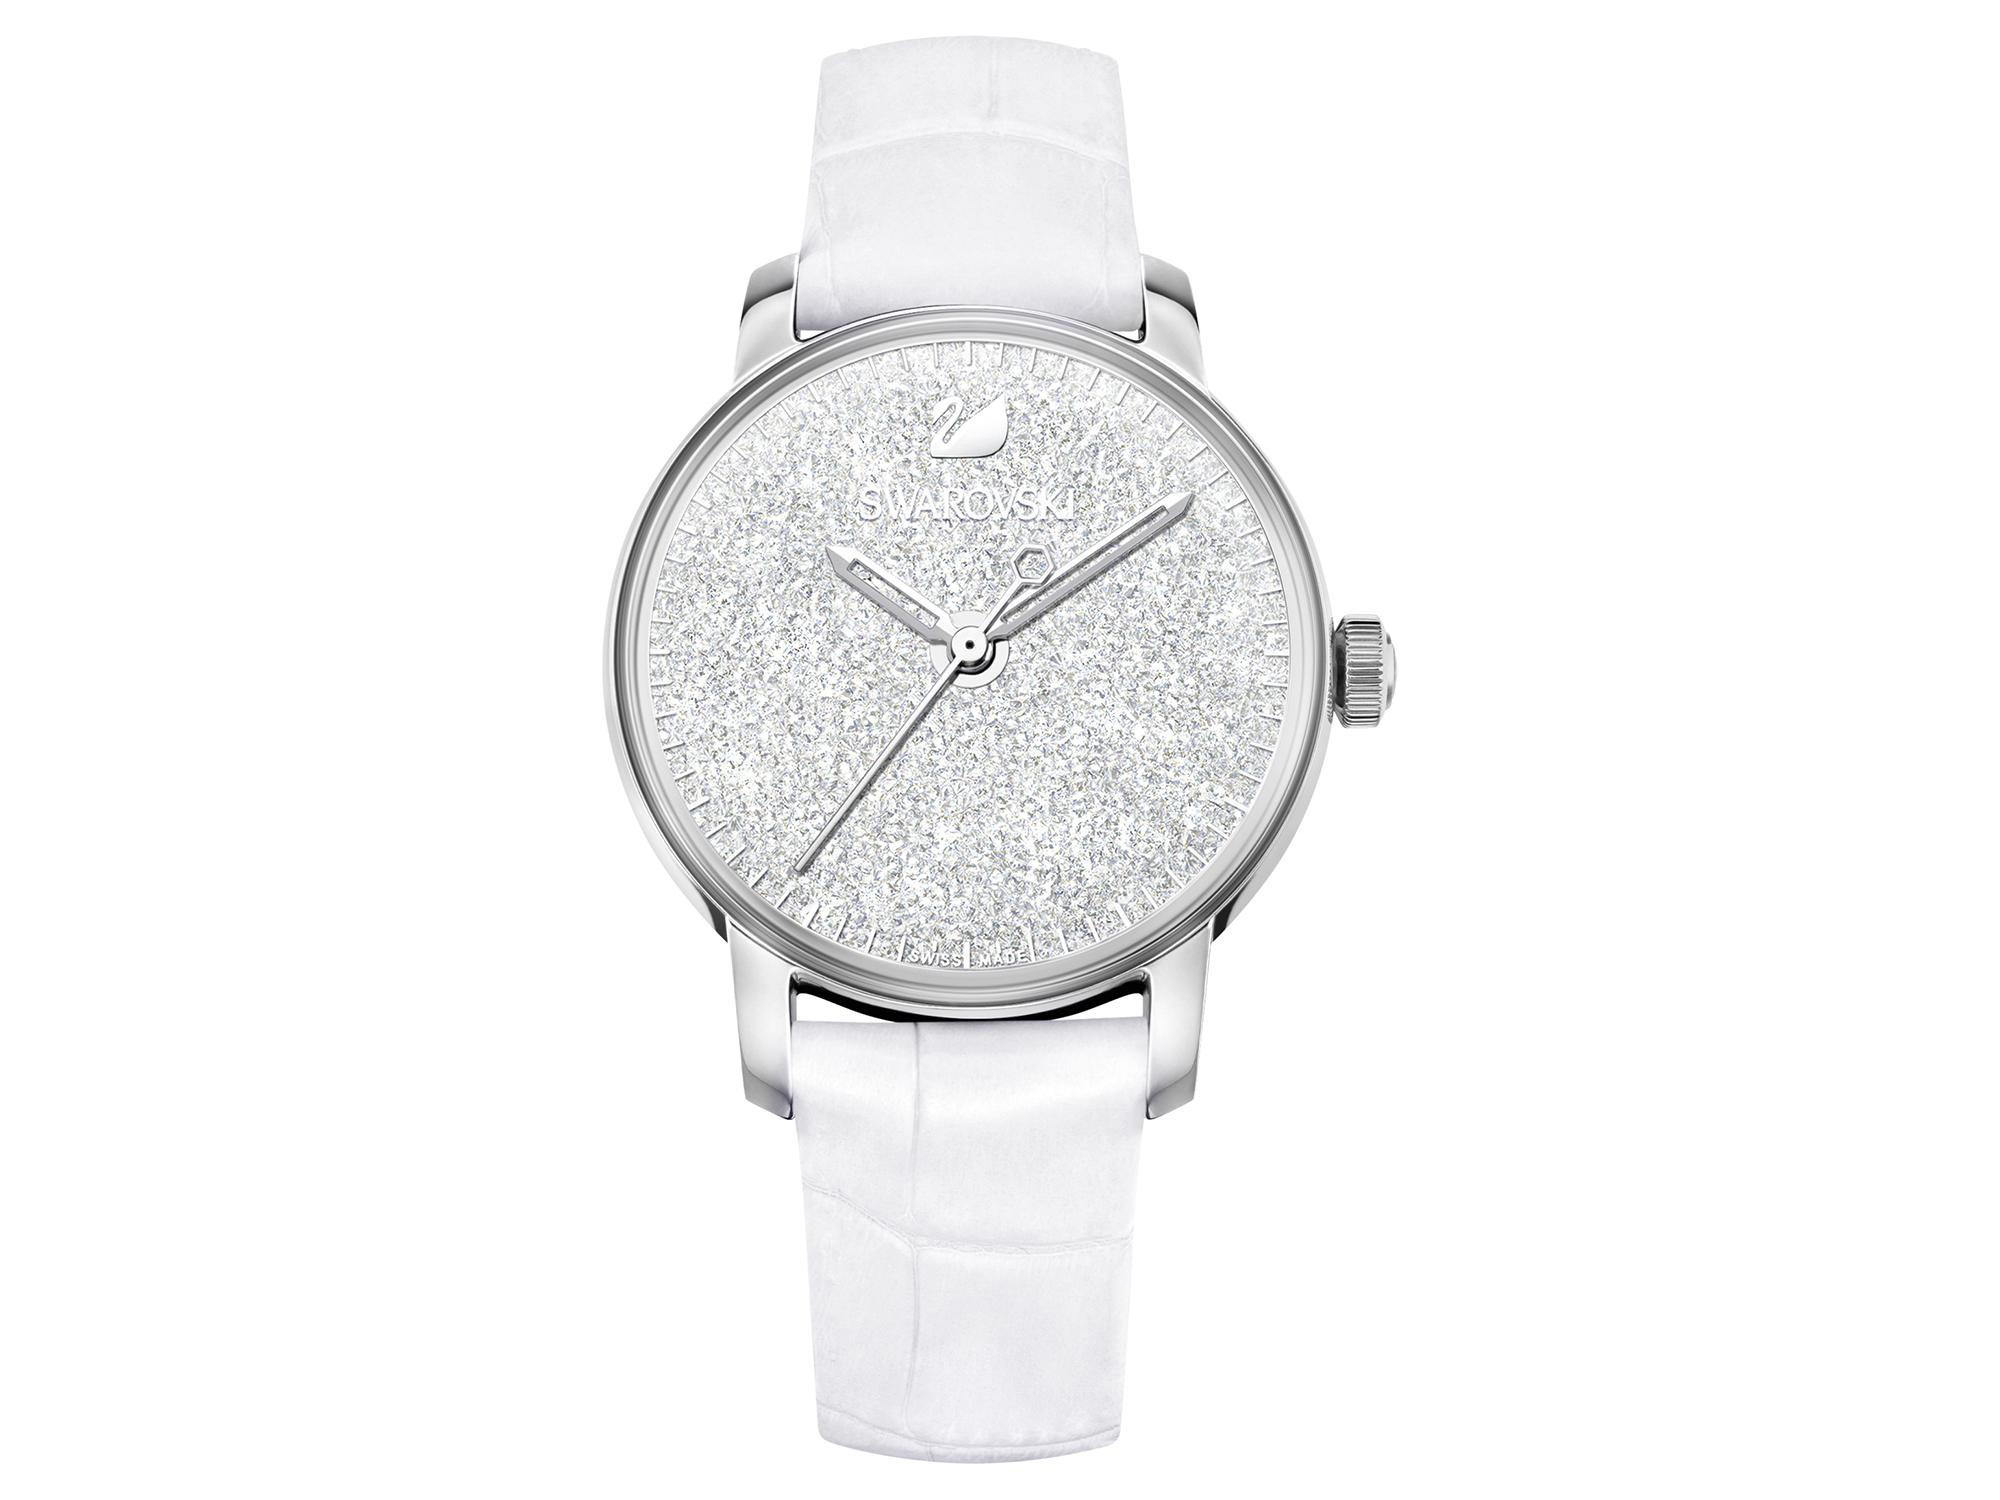 Reloj Crystalline Hours Cuarzon